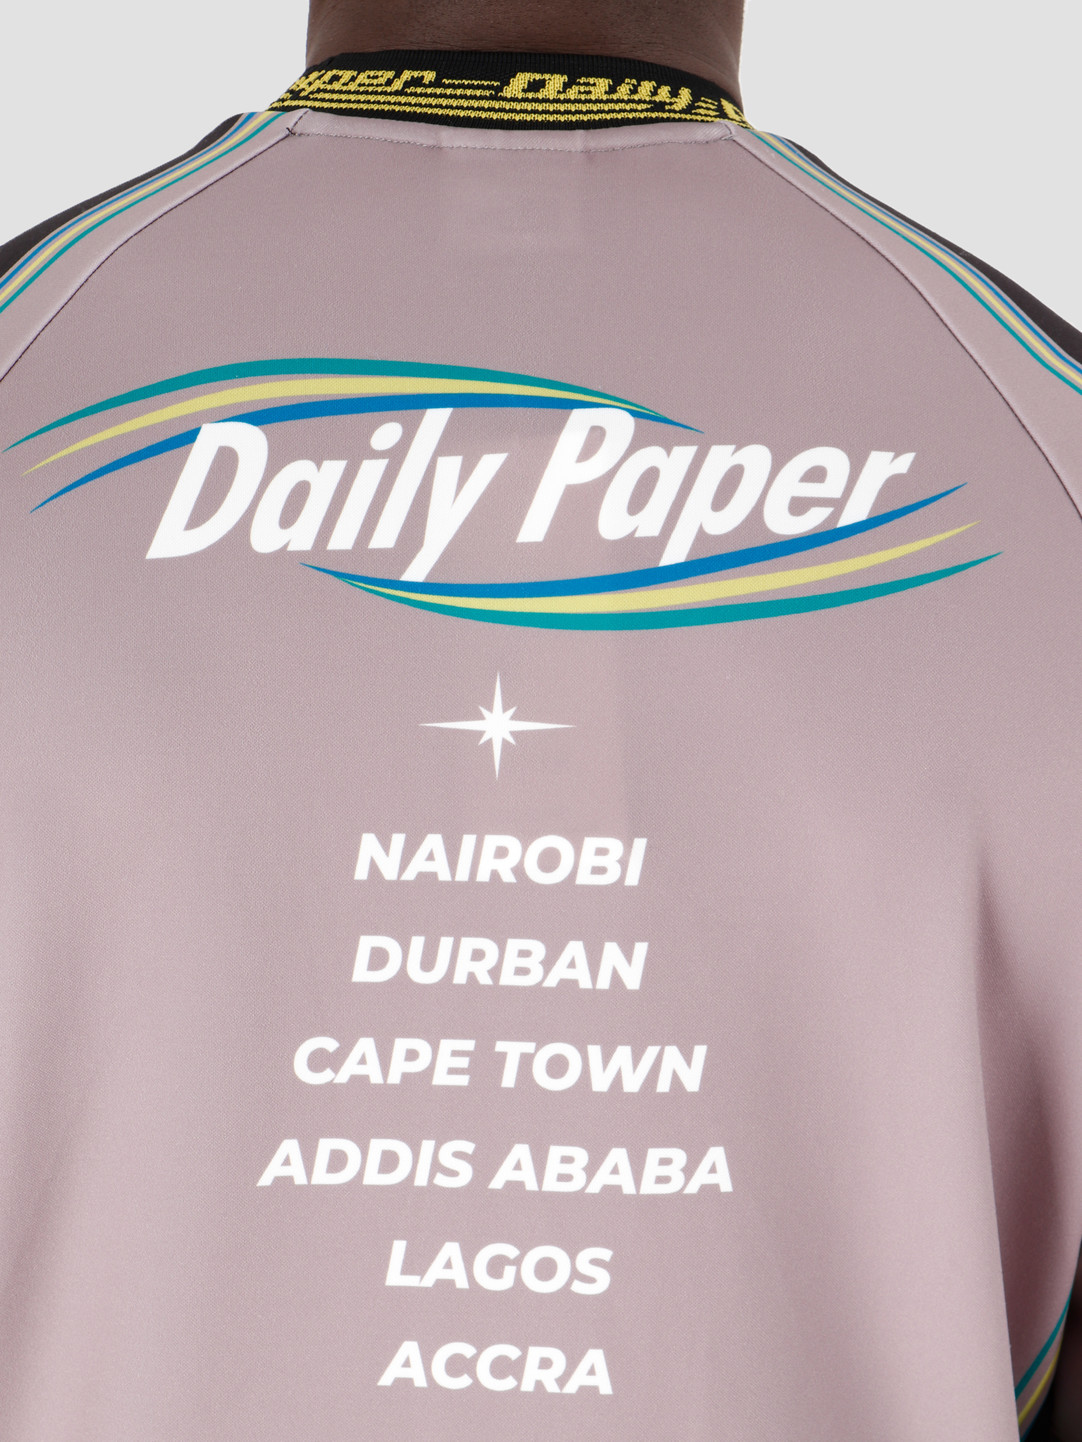 Daily Paper Daily Paper Gebike 2 Longsleeve Grey Color Block 19F1LS08-01